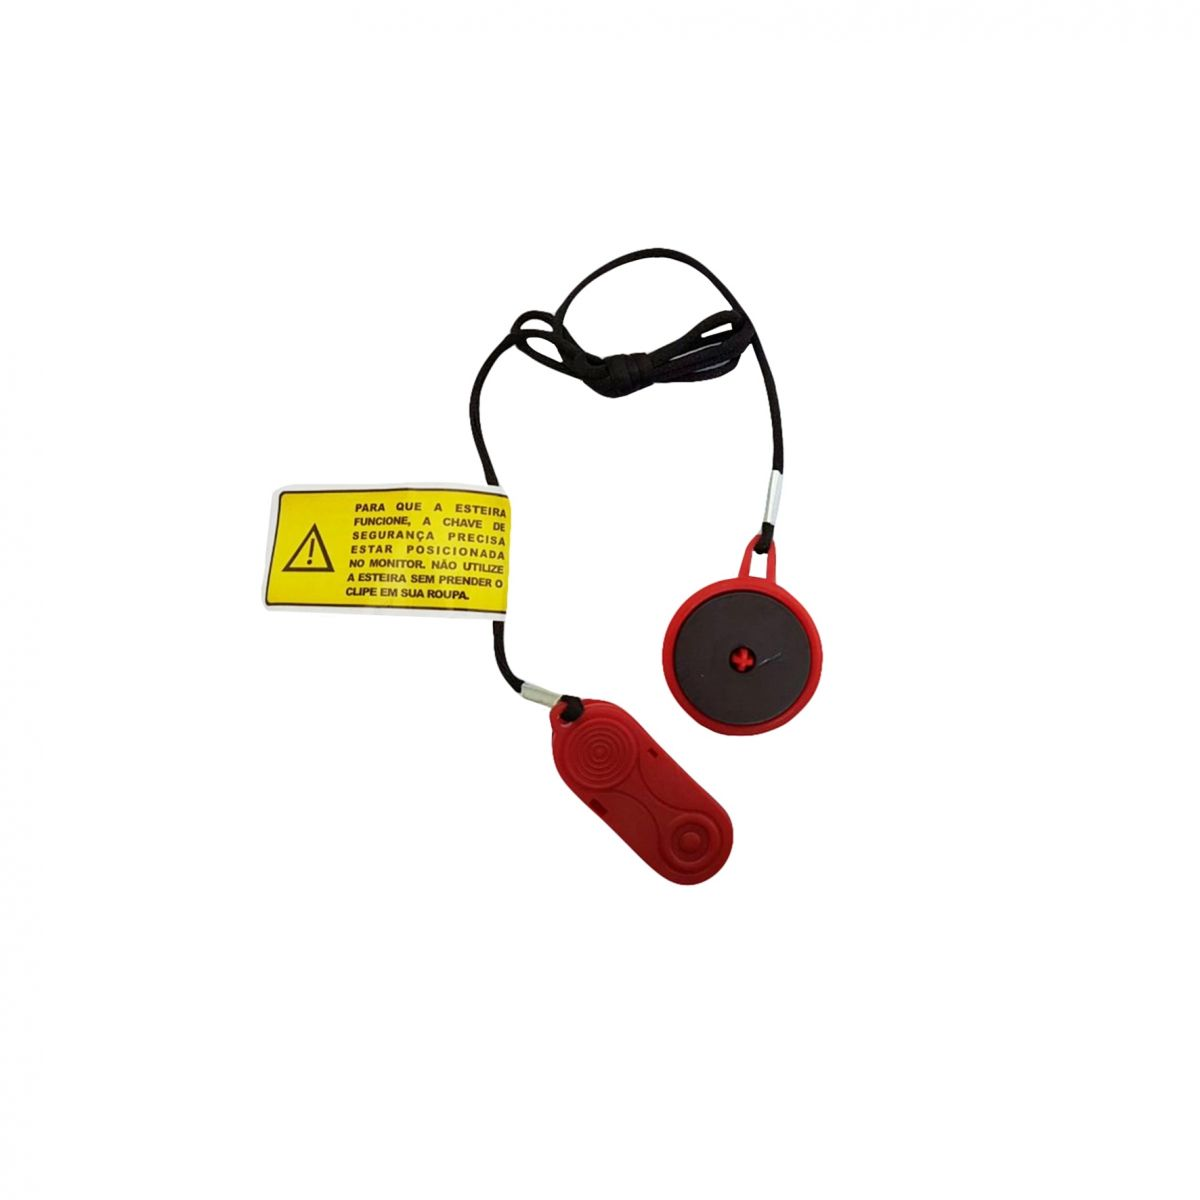 Chave de Segurança Esteira Athletic 3300EE 3400EE 820EE 3920